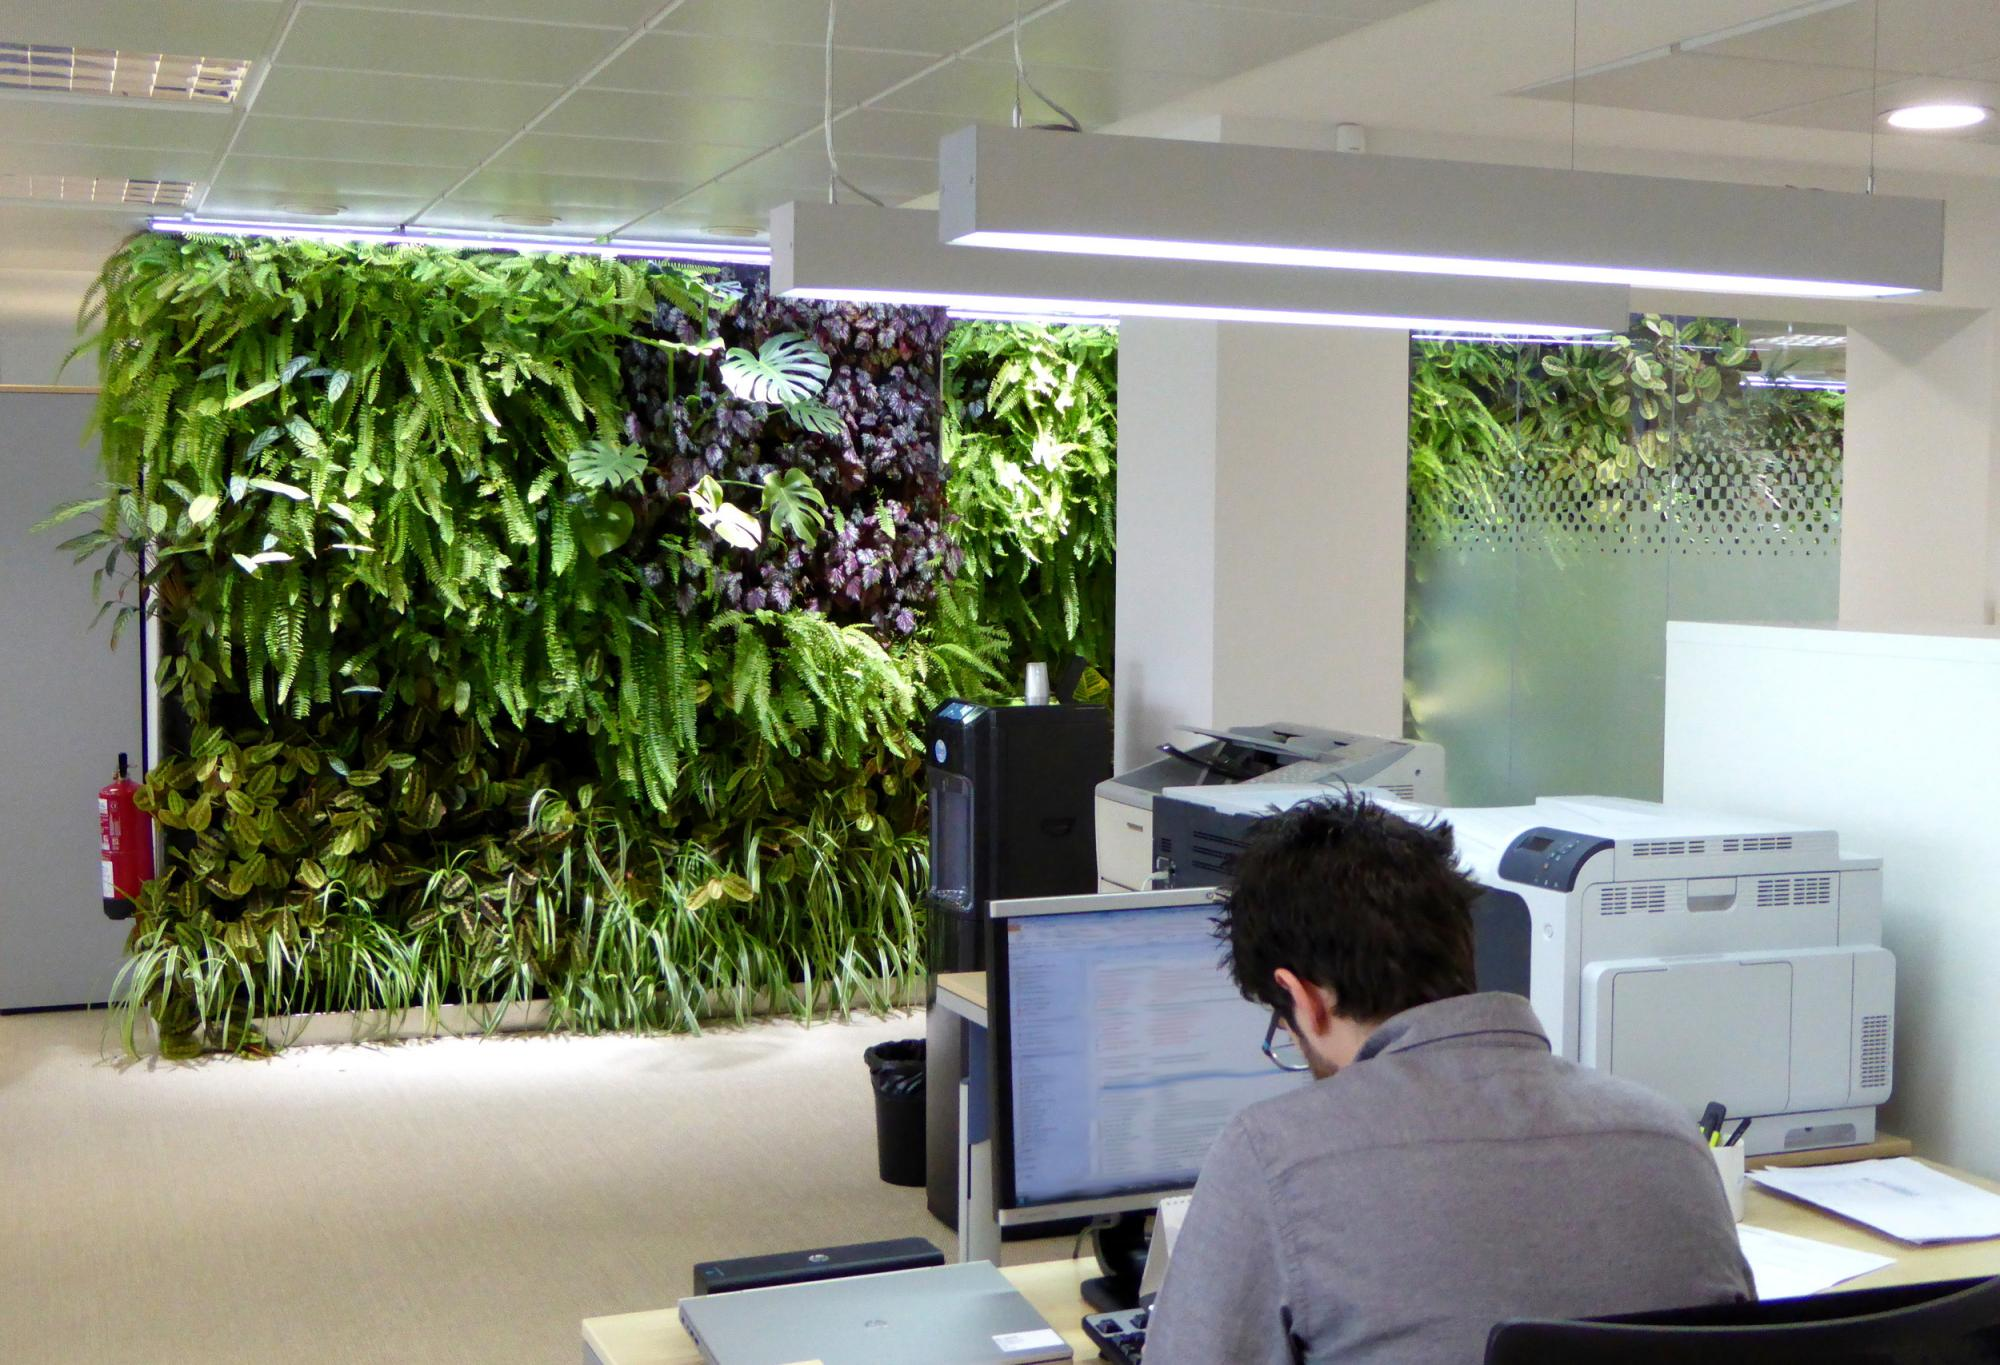 Jardines verticales en madrid 1 a o despu s singulargreen for Jardines verticales para terrazas